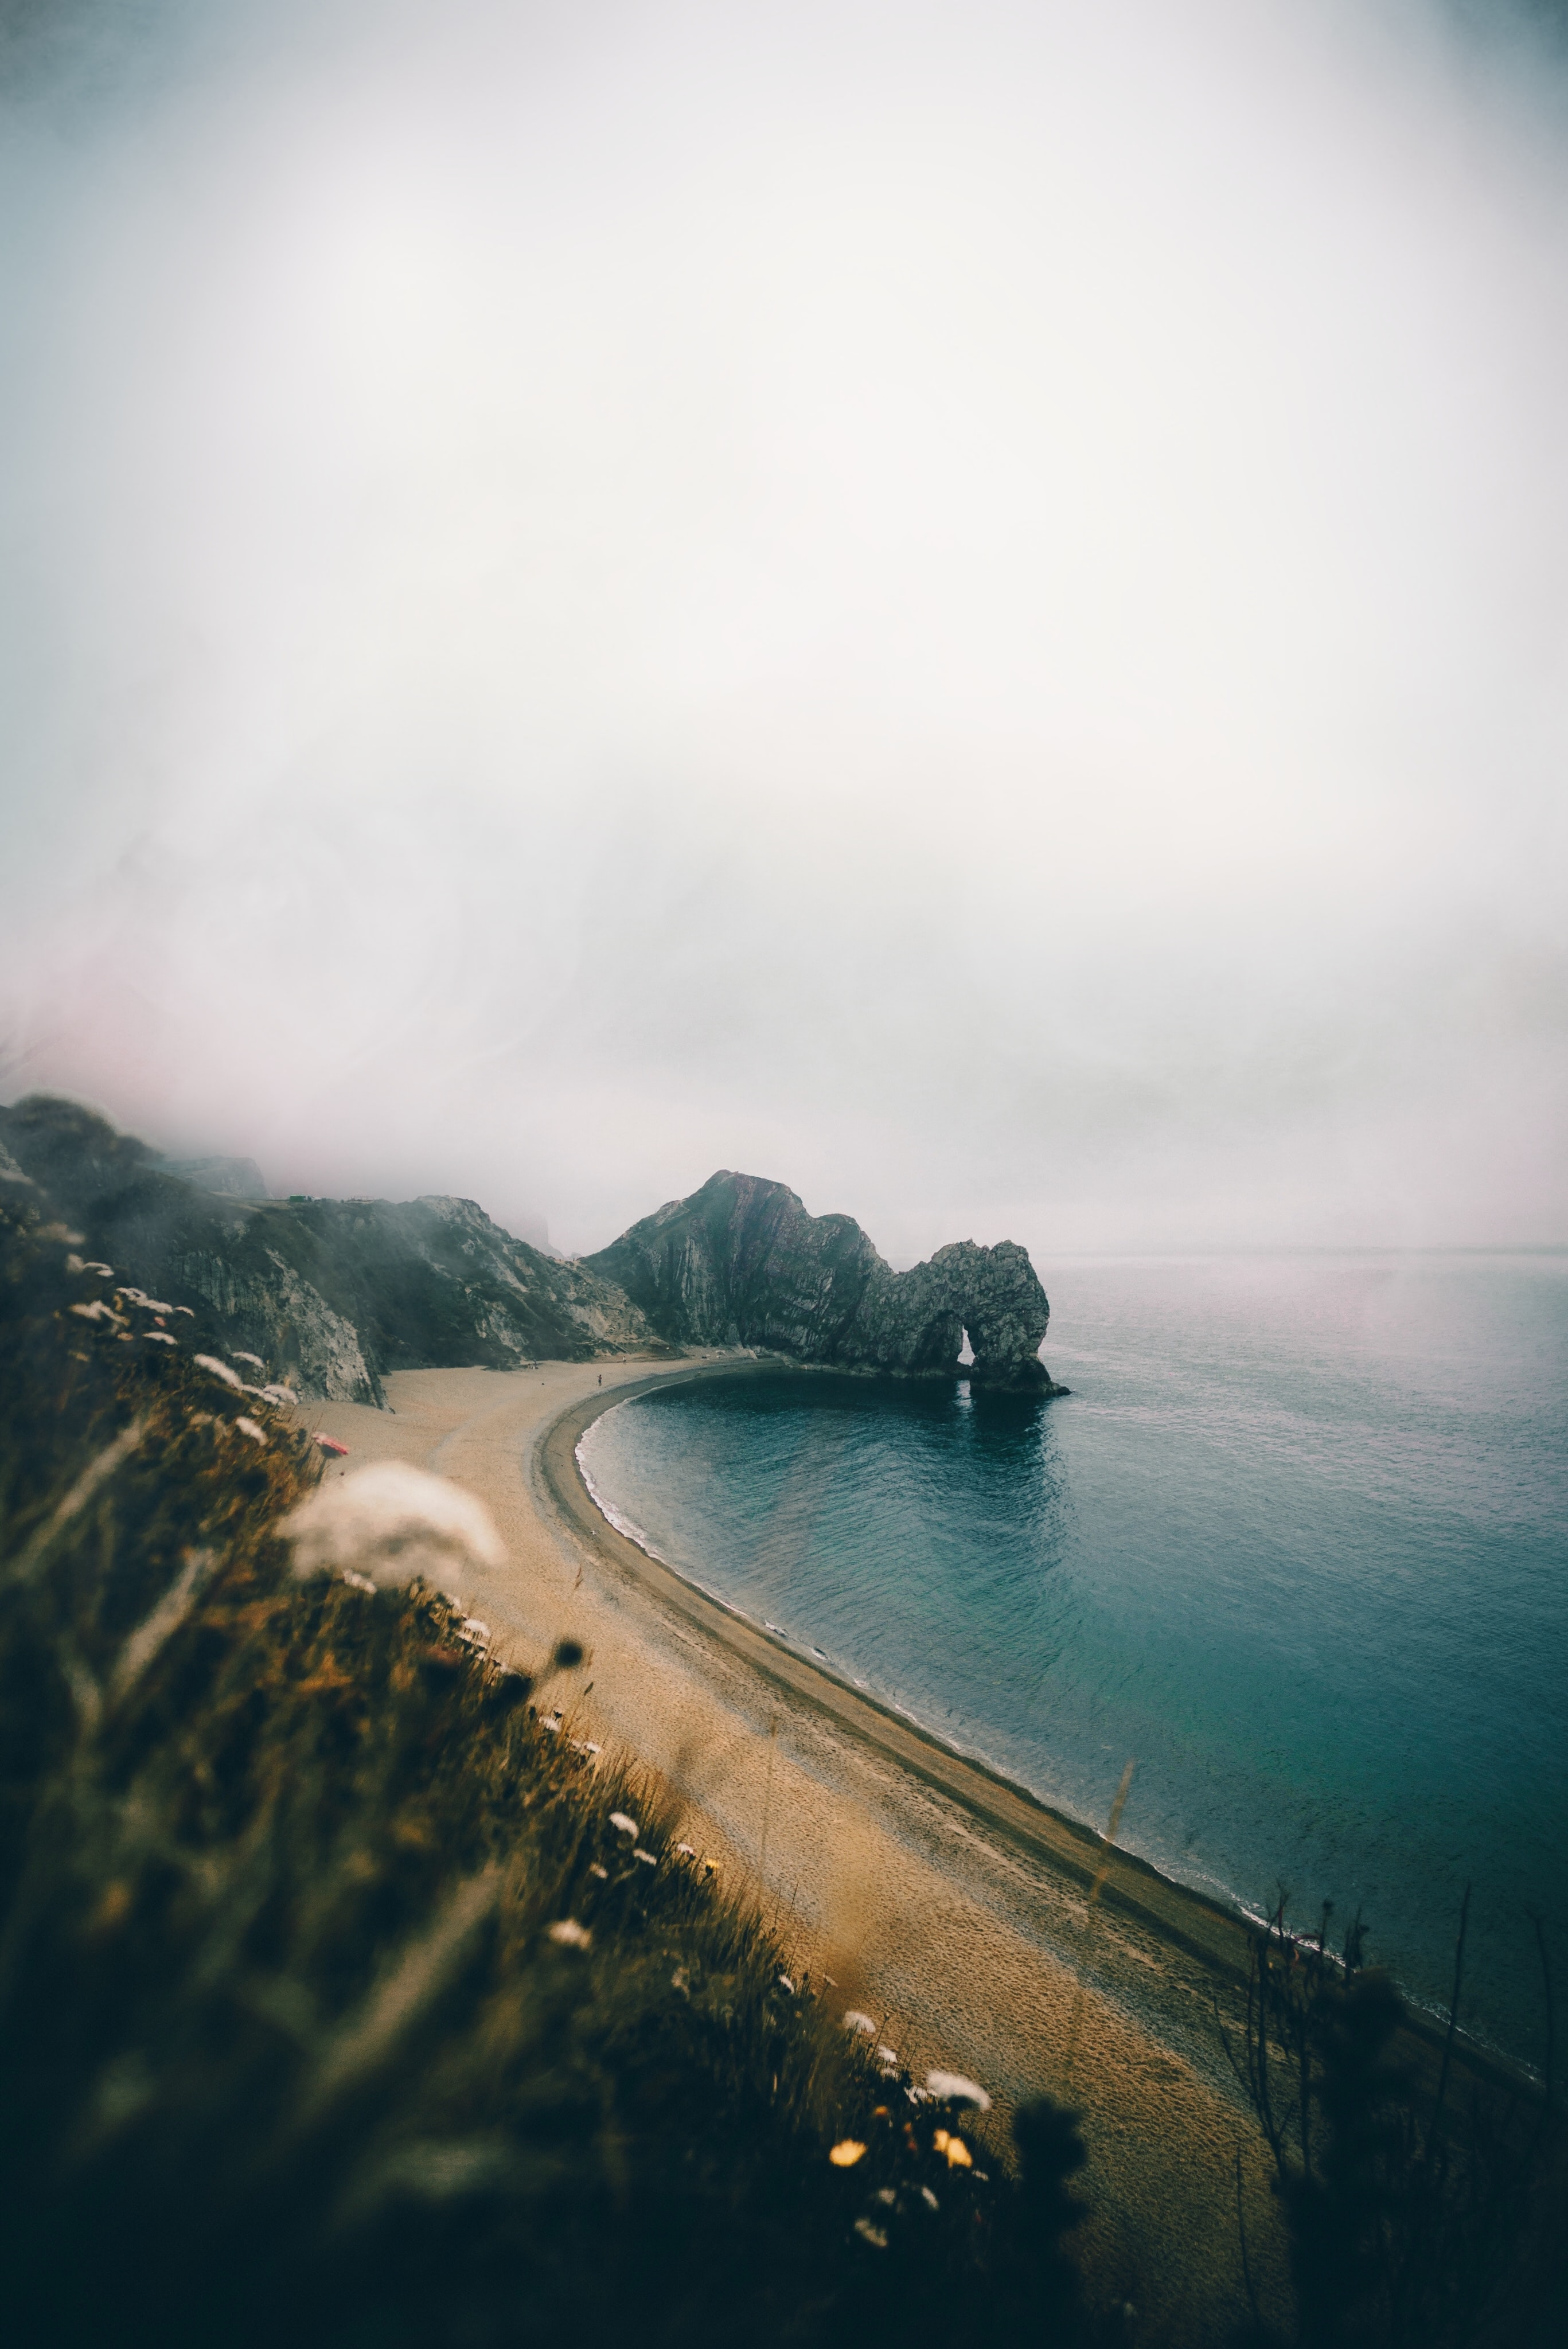 seashore under cloudy sky